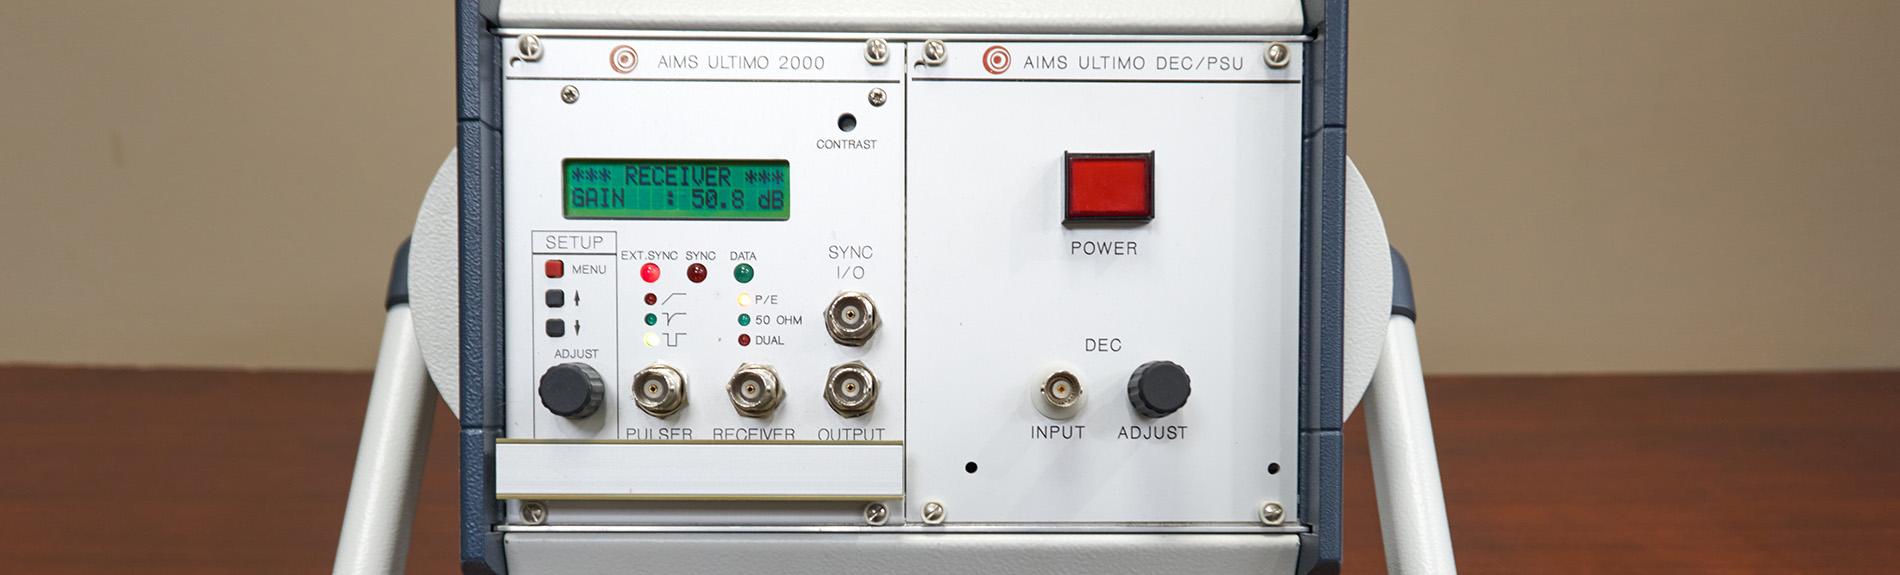 UTEX Instruments Slide - Slide 3